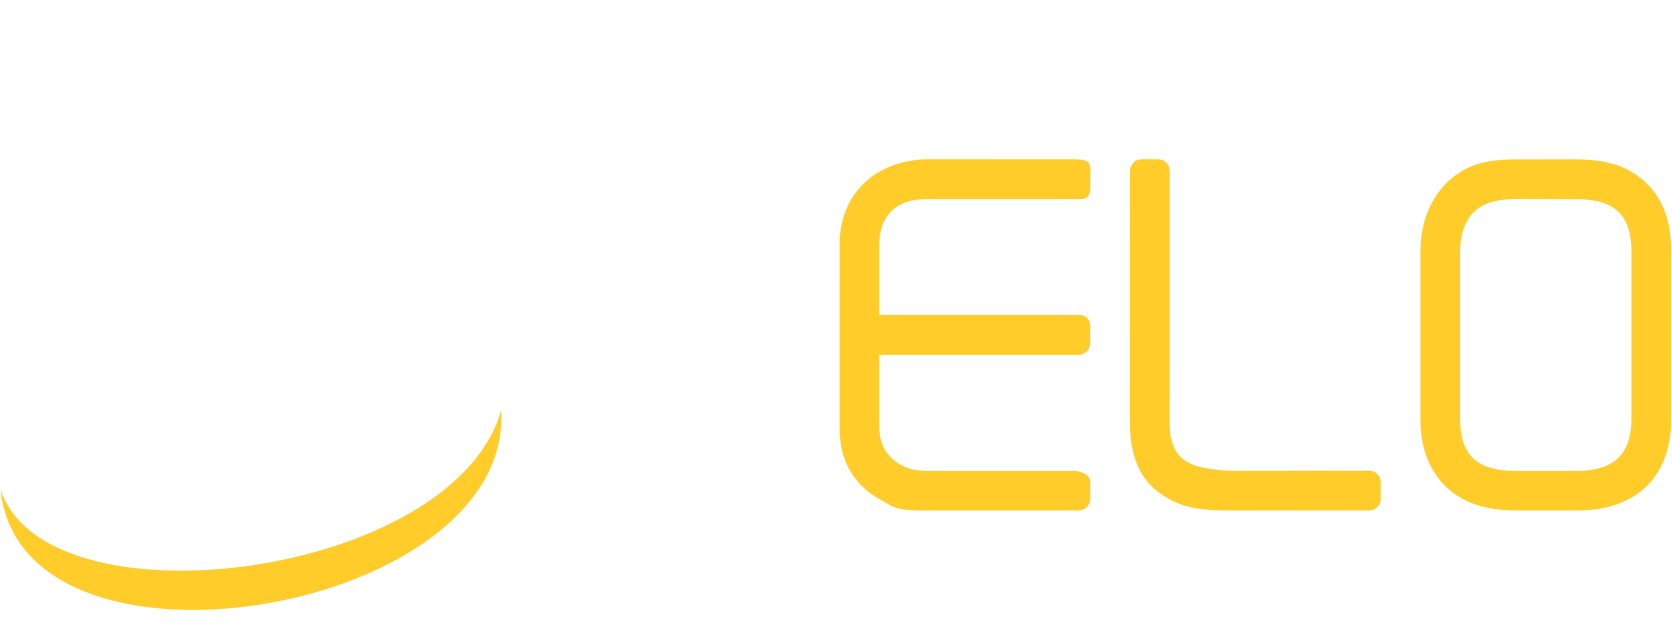 Zelo Produtos Personalizados